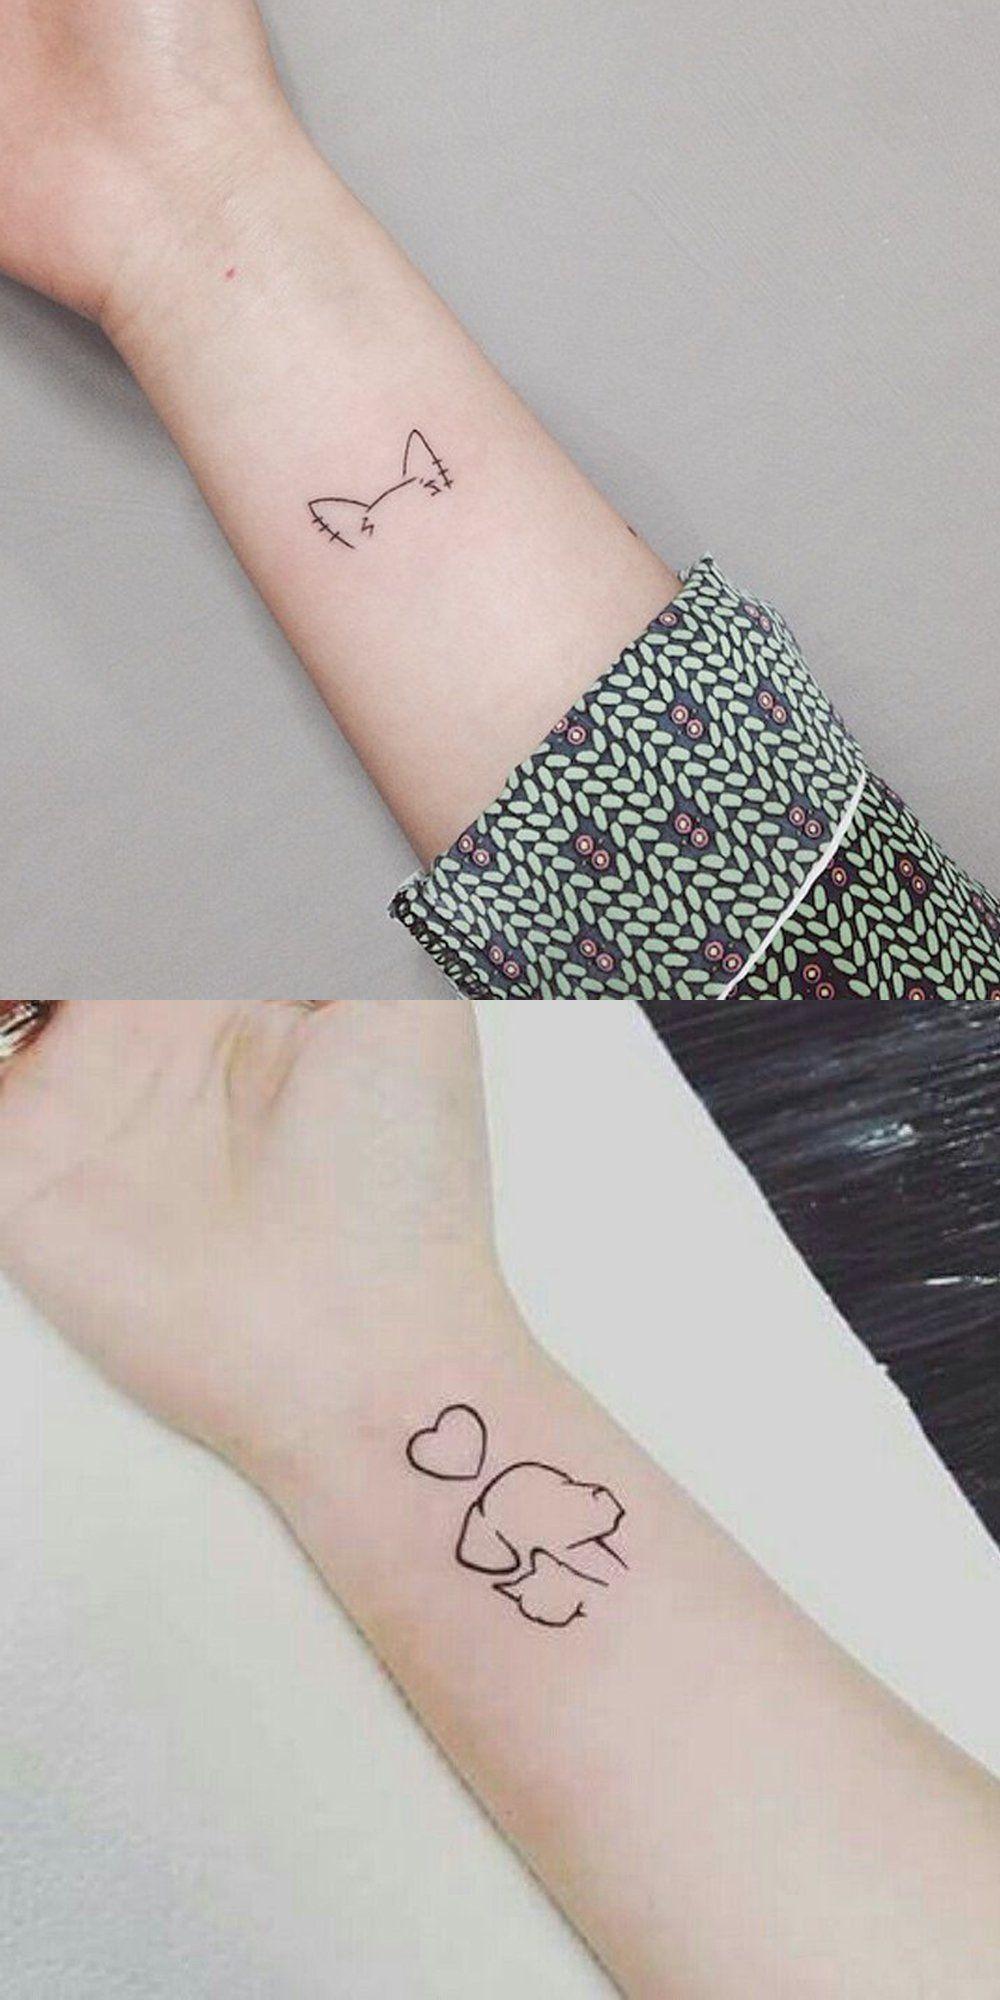 30 Cute Small & Simple Dog Tattoo Ideas for Women Animal